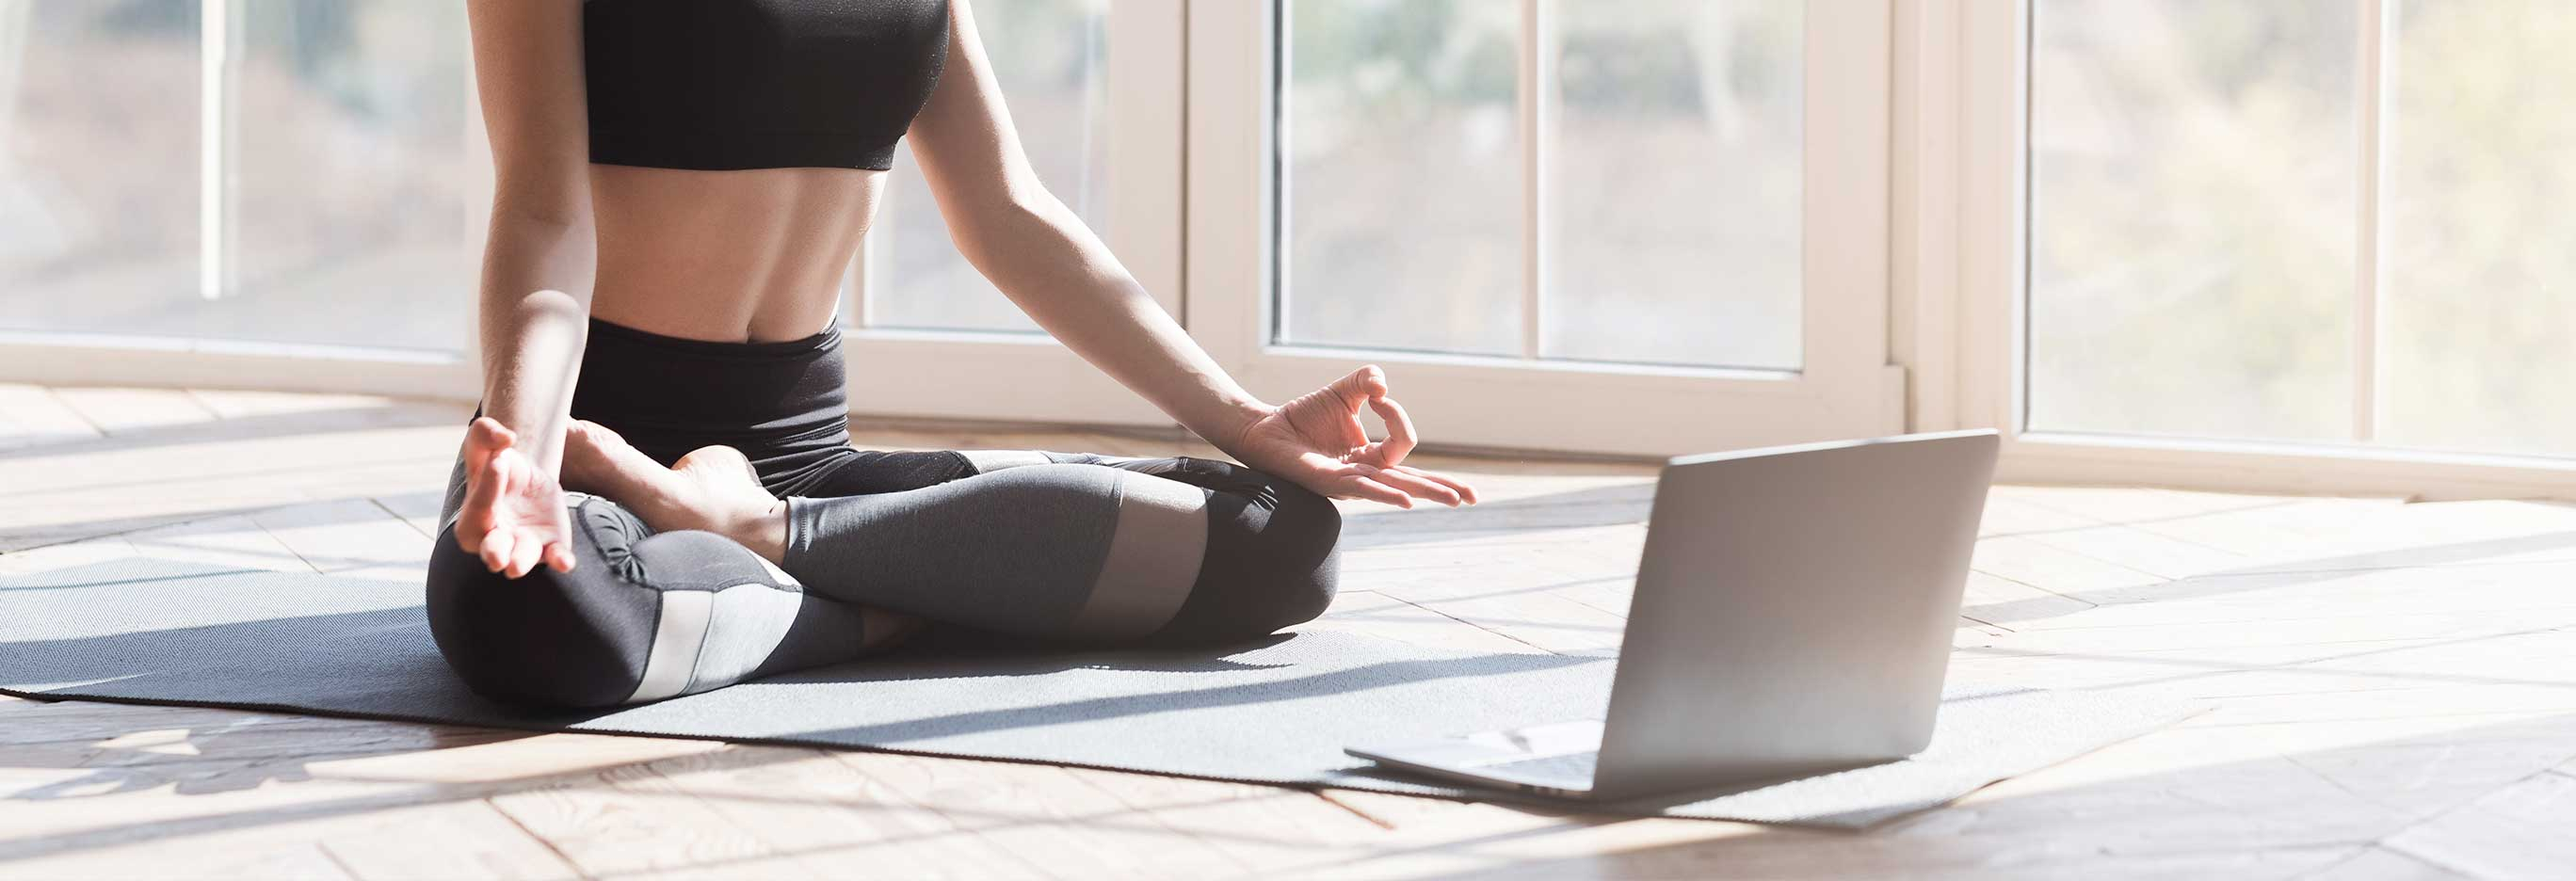 yoga-video2.jpg